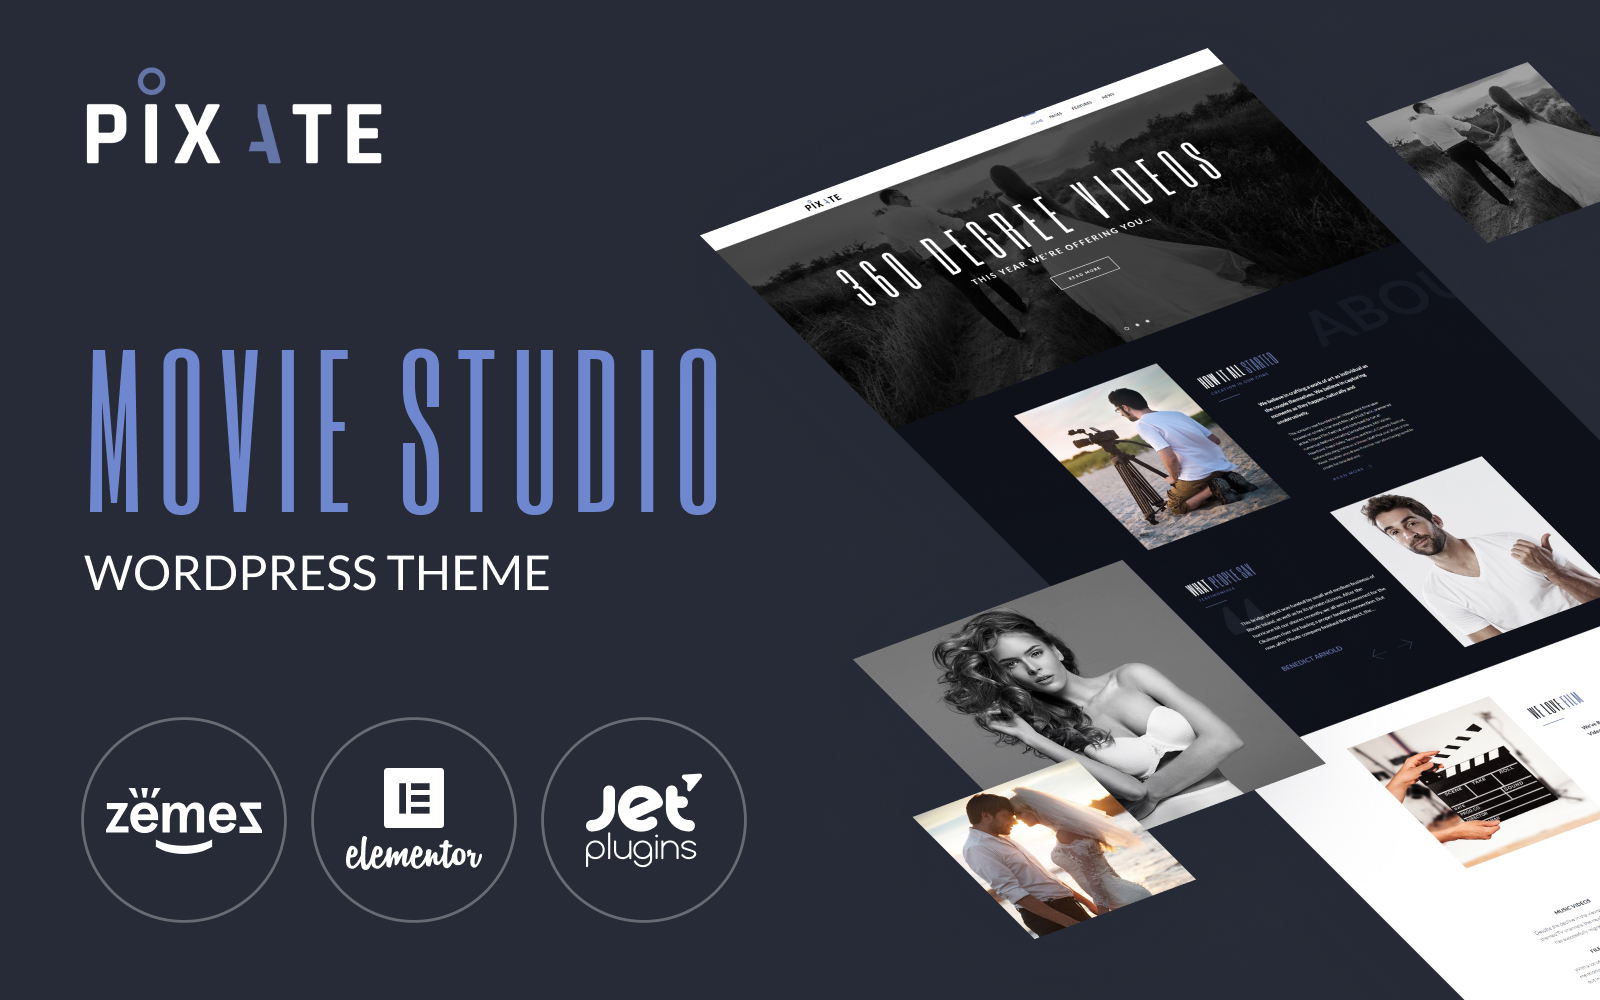 Responsive Pixate - Movie Studio WordPress Theme #65159